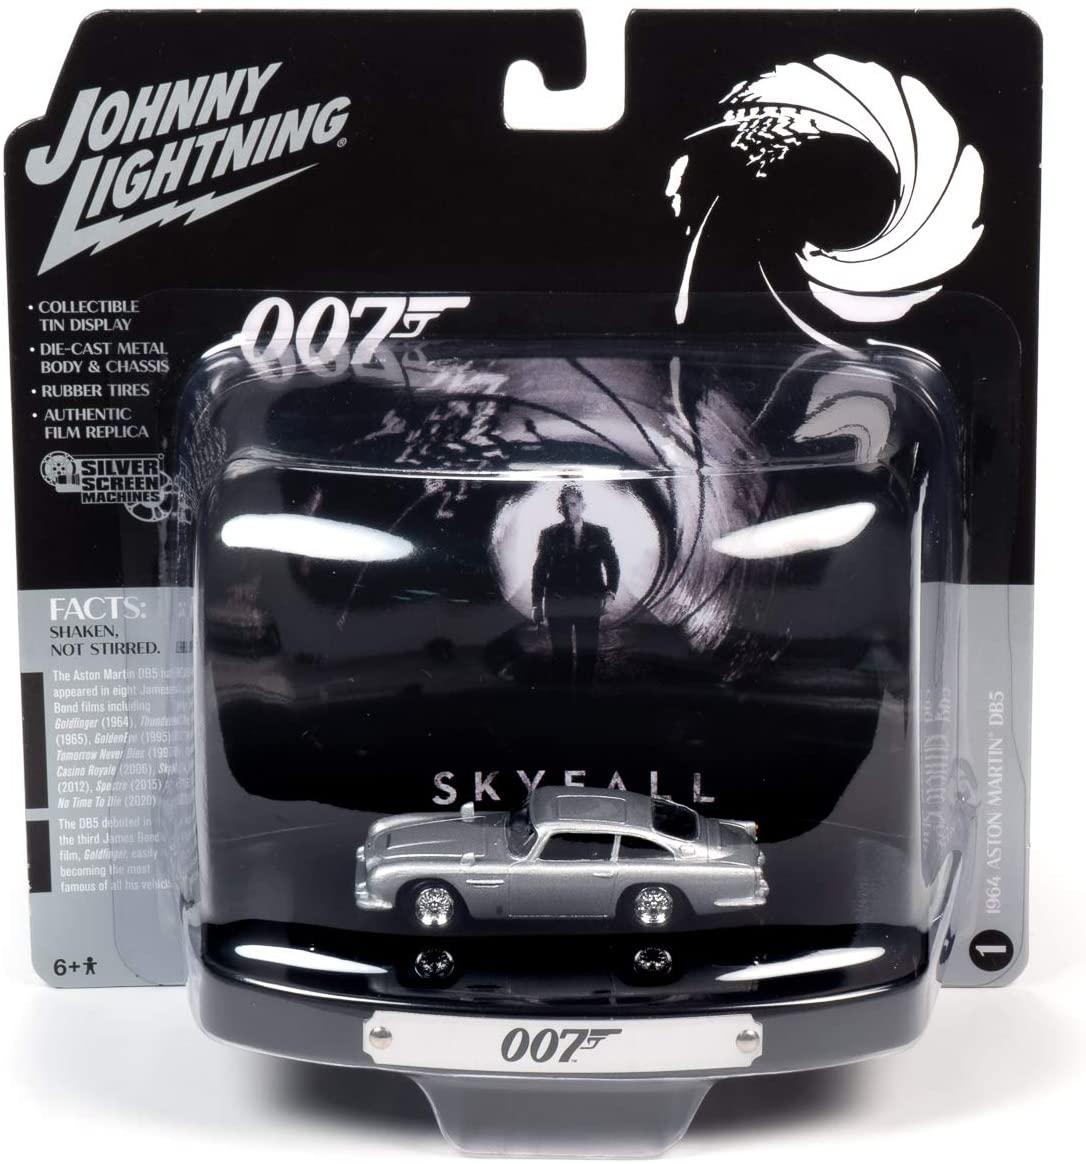 1964 Aston Martin DB5 Silver Birch w/Collectible Tin Display 007